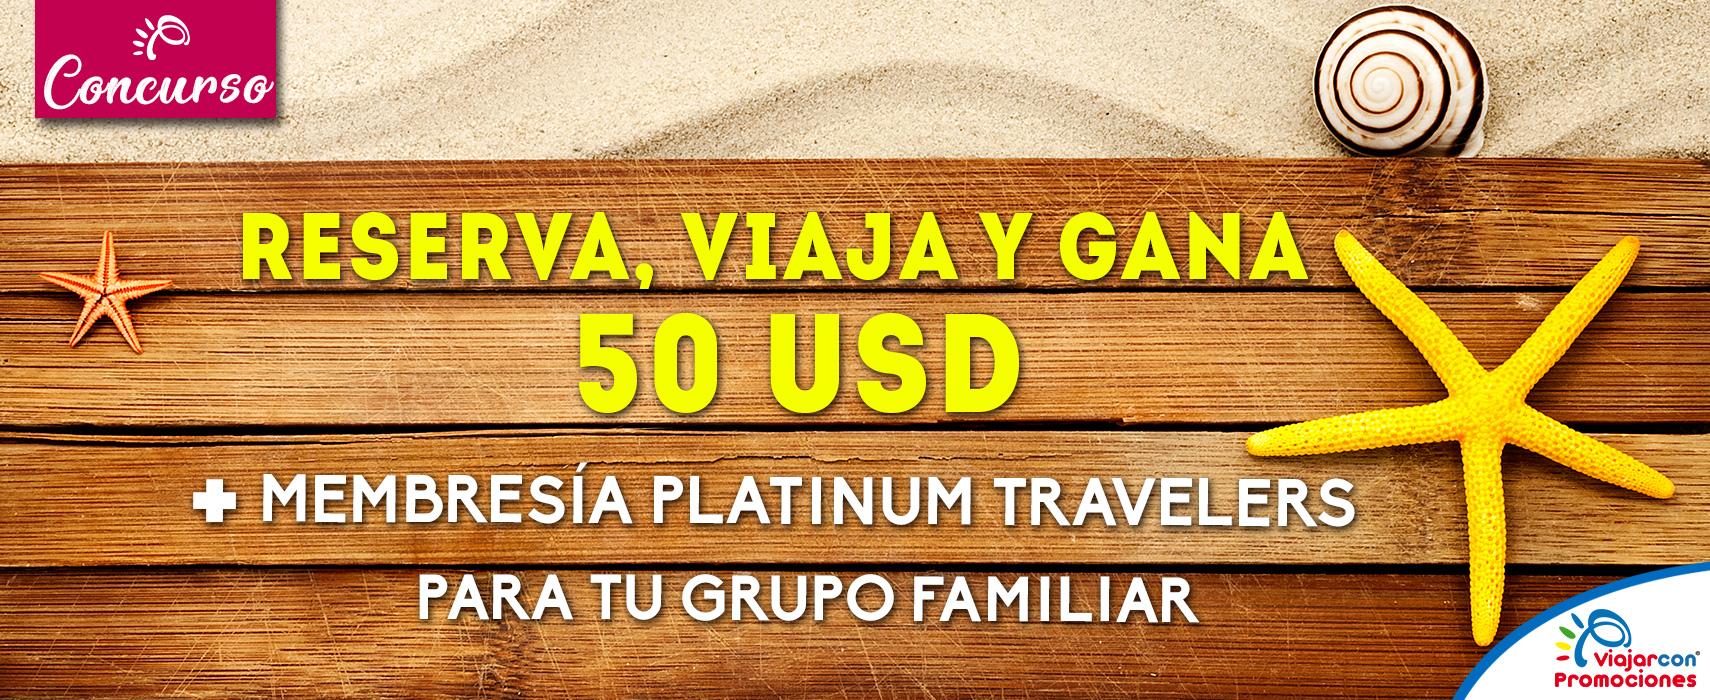 Concurso Membresías Platinum Travelers